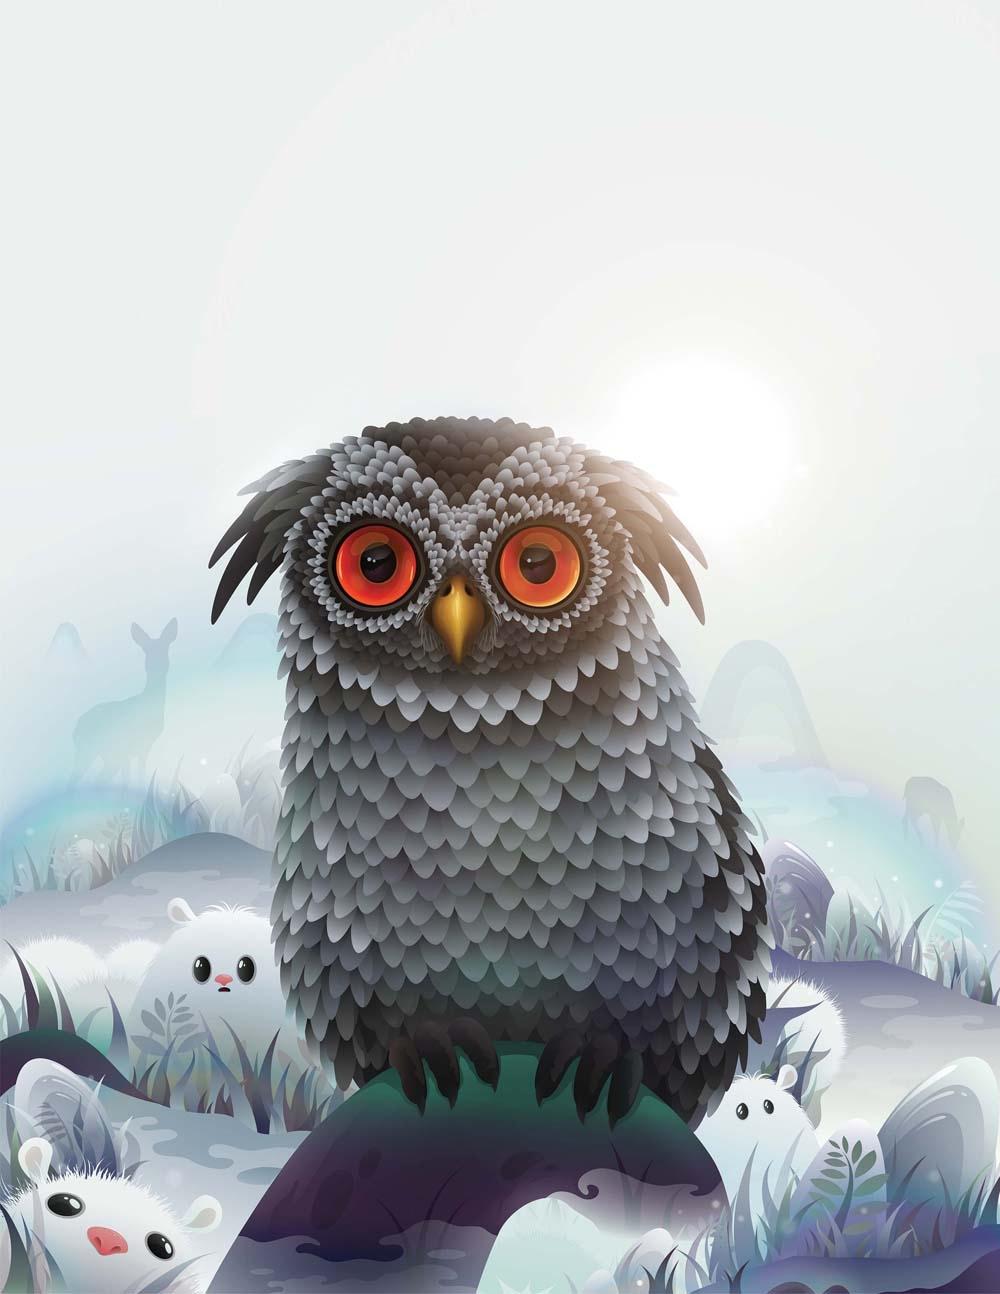 adobe-illustrator-tutorial-master-dynamic-gradient-techniques-digital-arts-1392486598g4n8k.jpg (1000×1294)